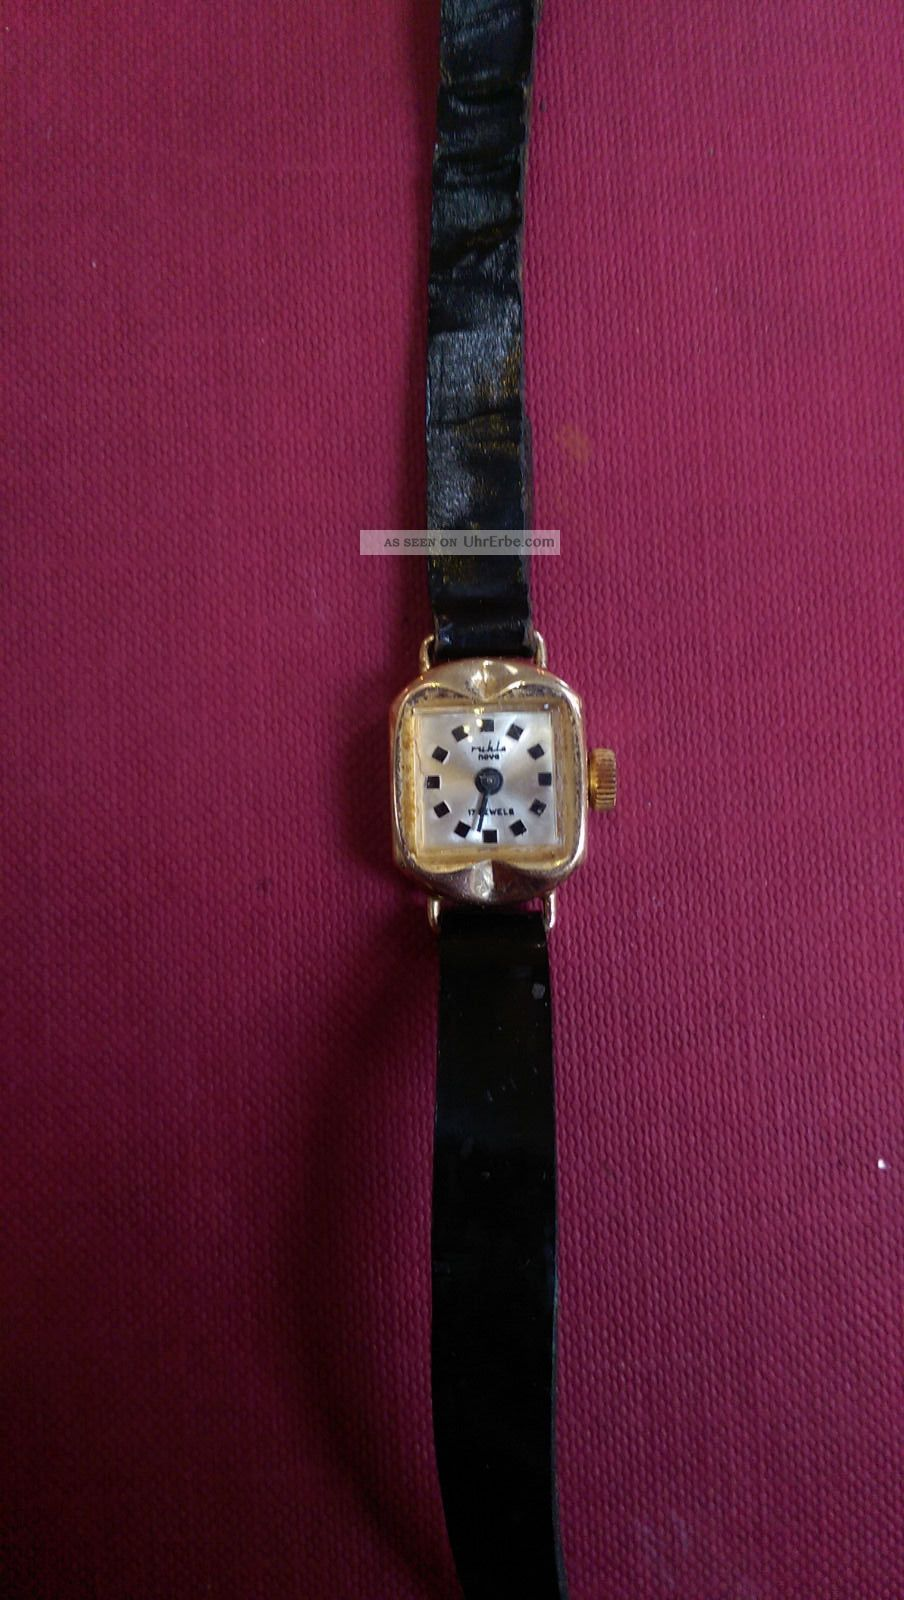 Ruhla Armbanduhr 17 Jewels Plaque 14 Karat Armbanduhren Bild